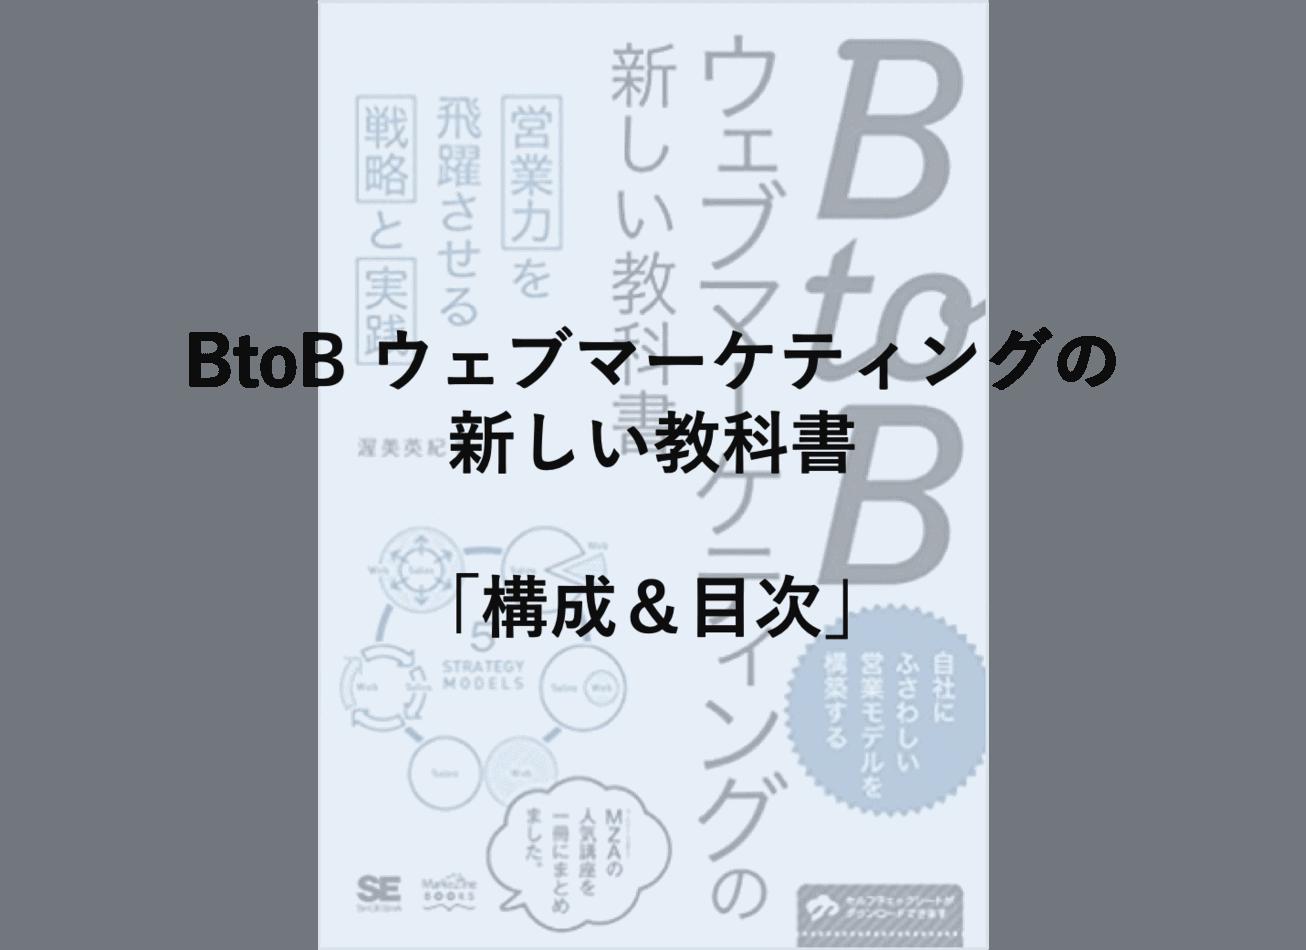 BtoBウェブマーケティングの新しい教科書の構成や目次など